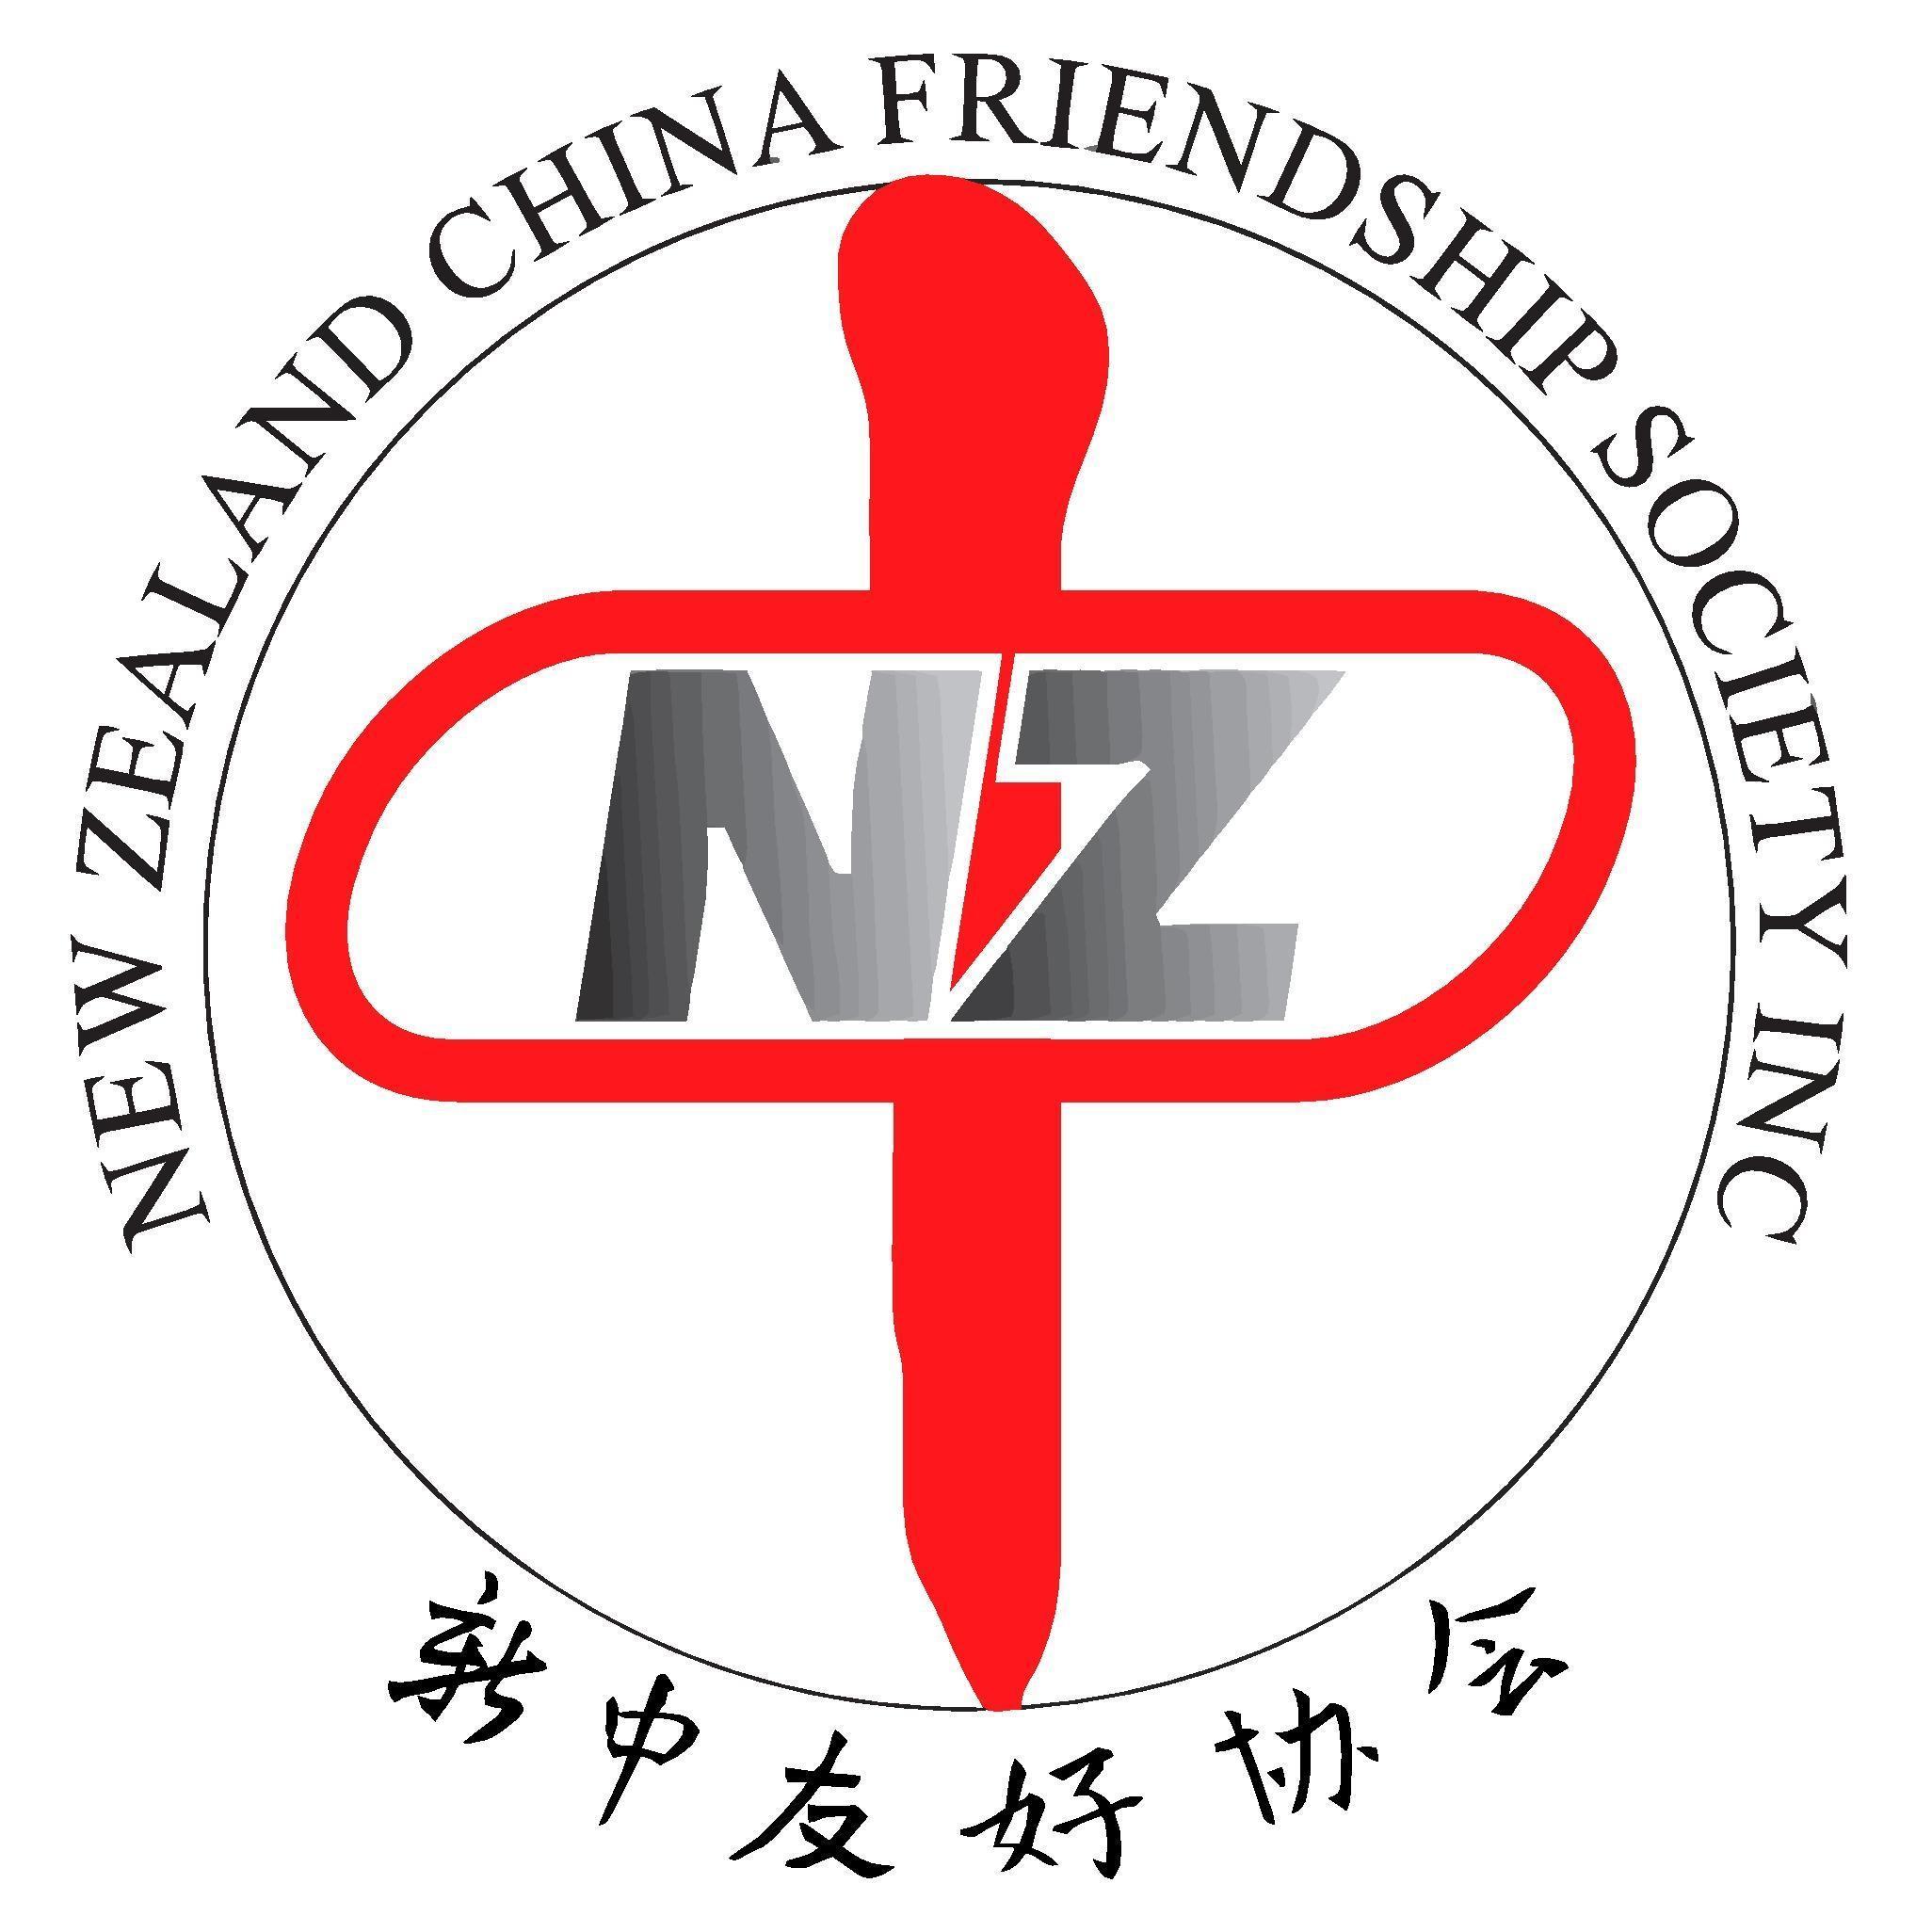 Nz china friendship nzchinasociety twitter nz china friendship biocorpaavc